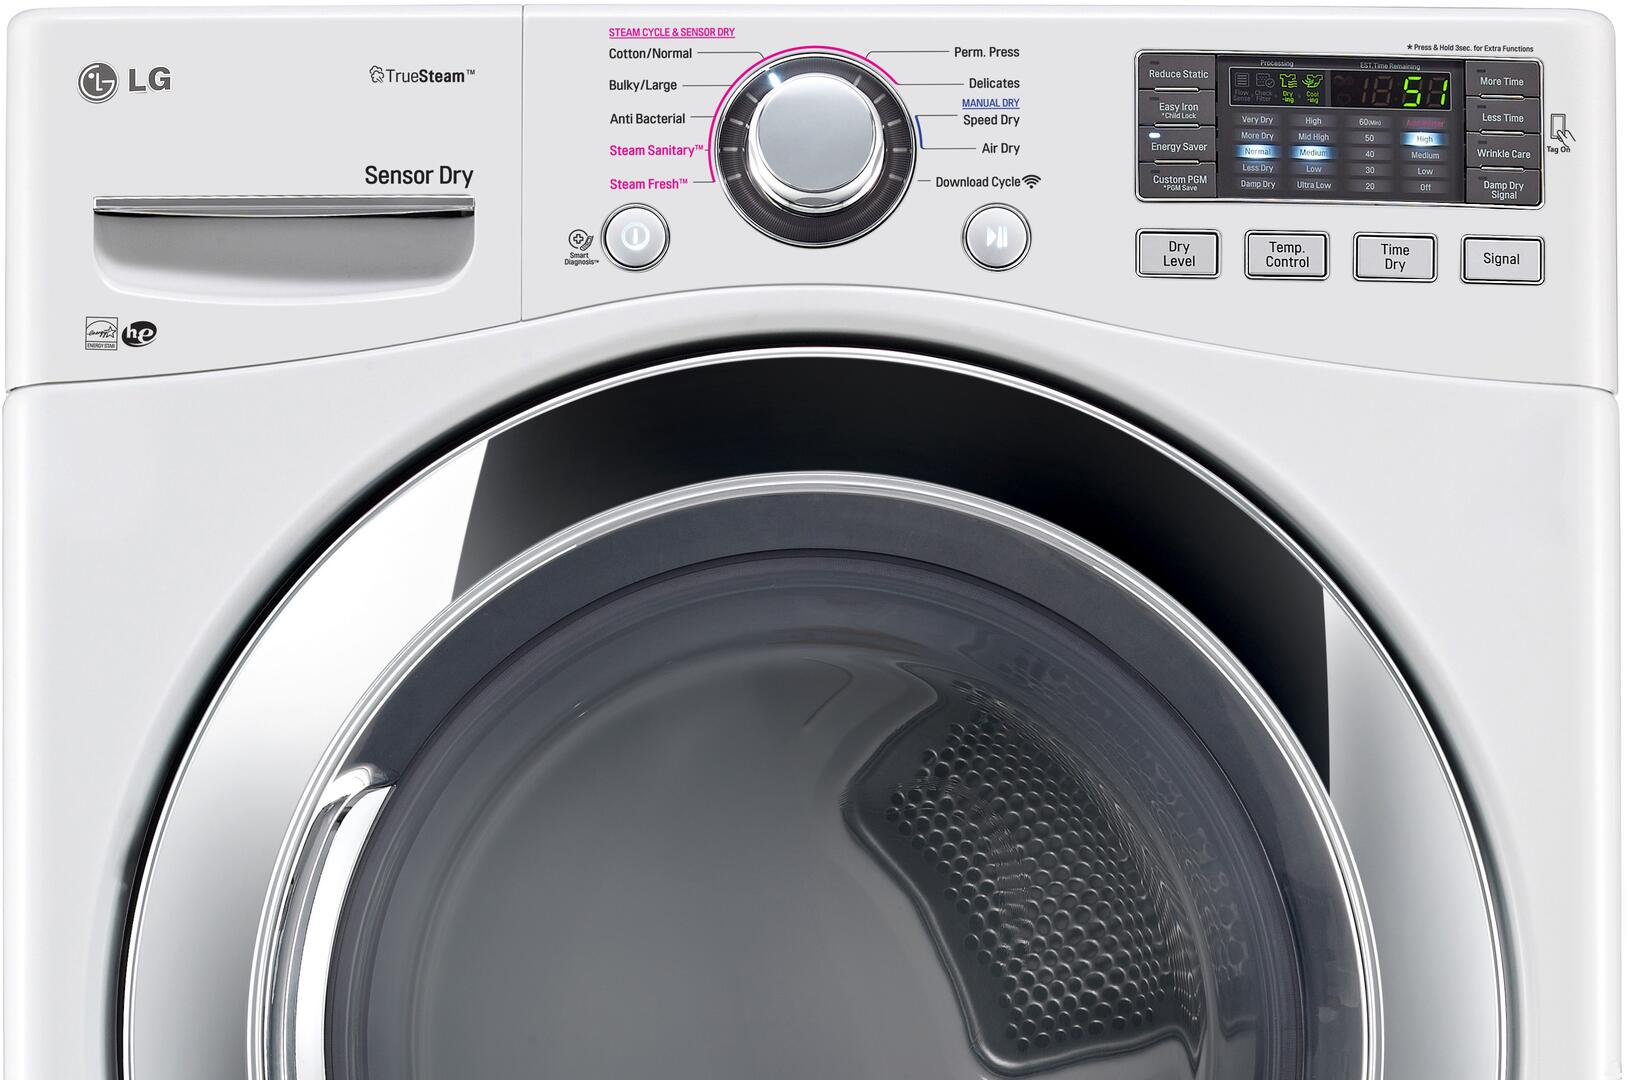 lg truesteam dryer owners manual rh lg truesteam dryer owners manual ballew us